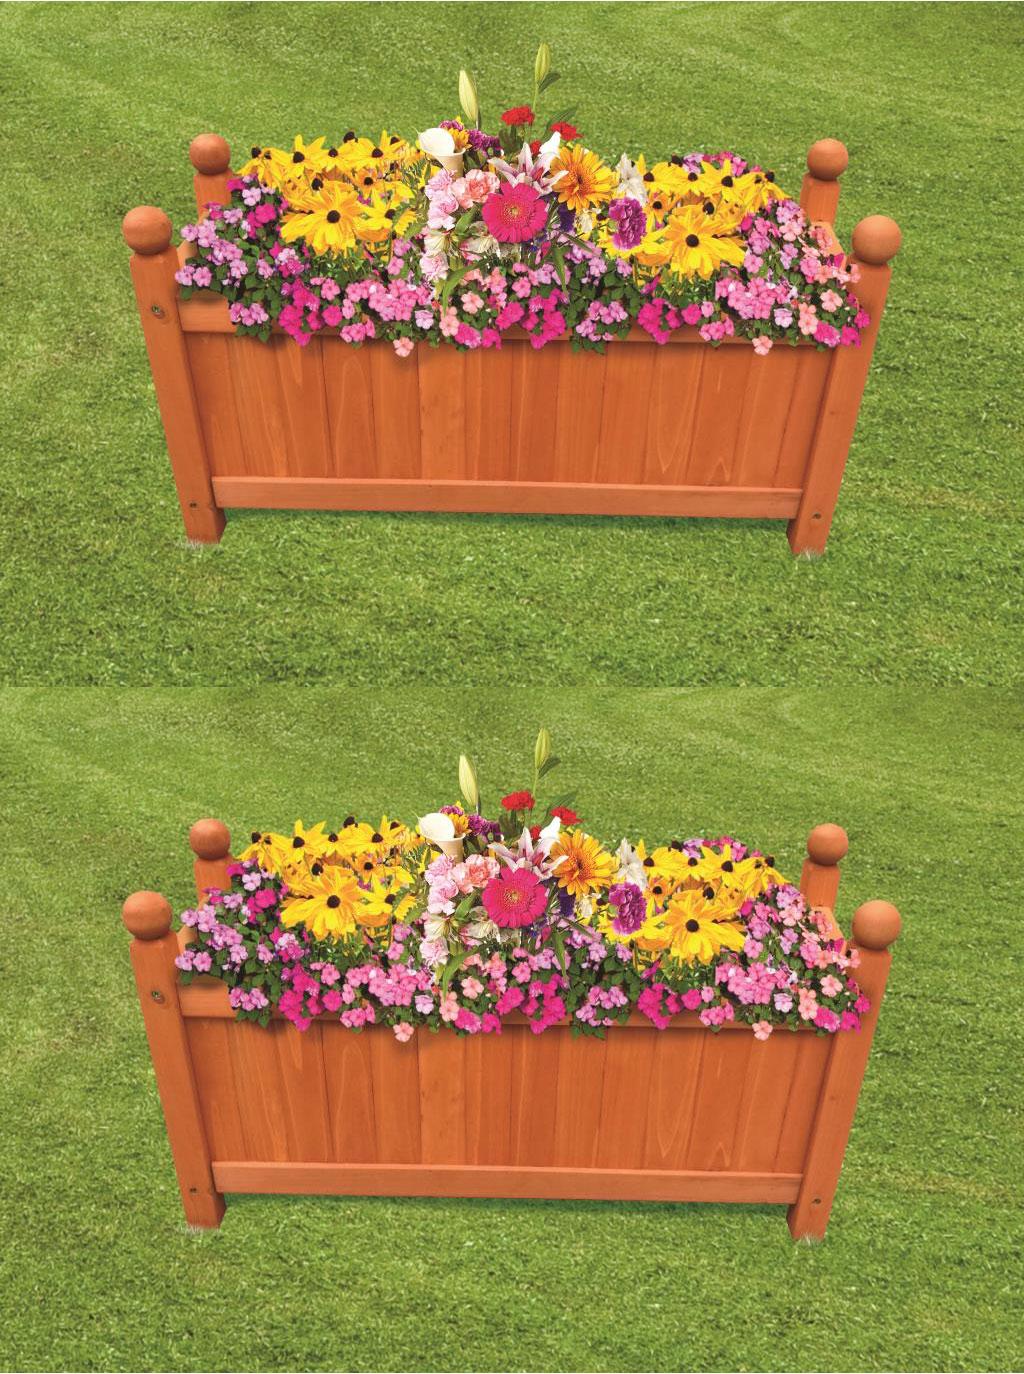 Wooden Garden Planters Outdoor Plants Flowers Pot Square